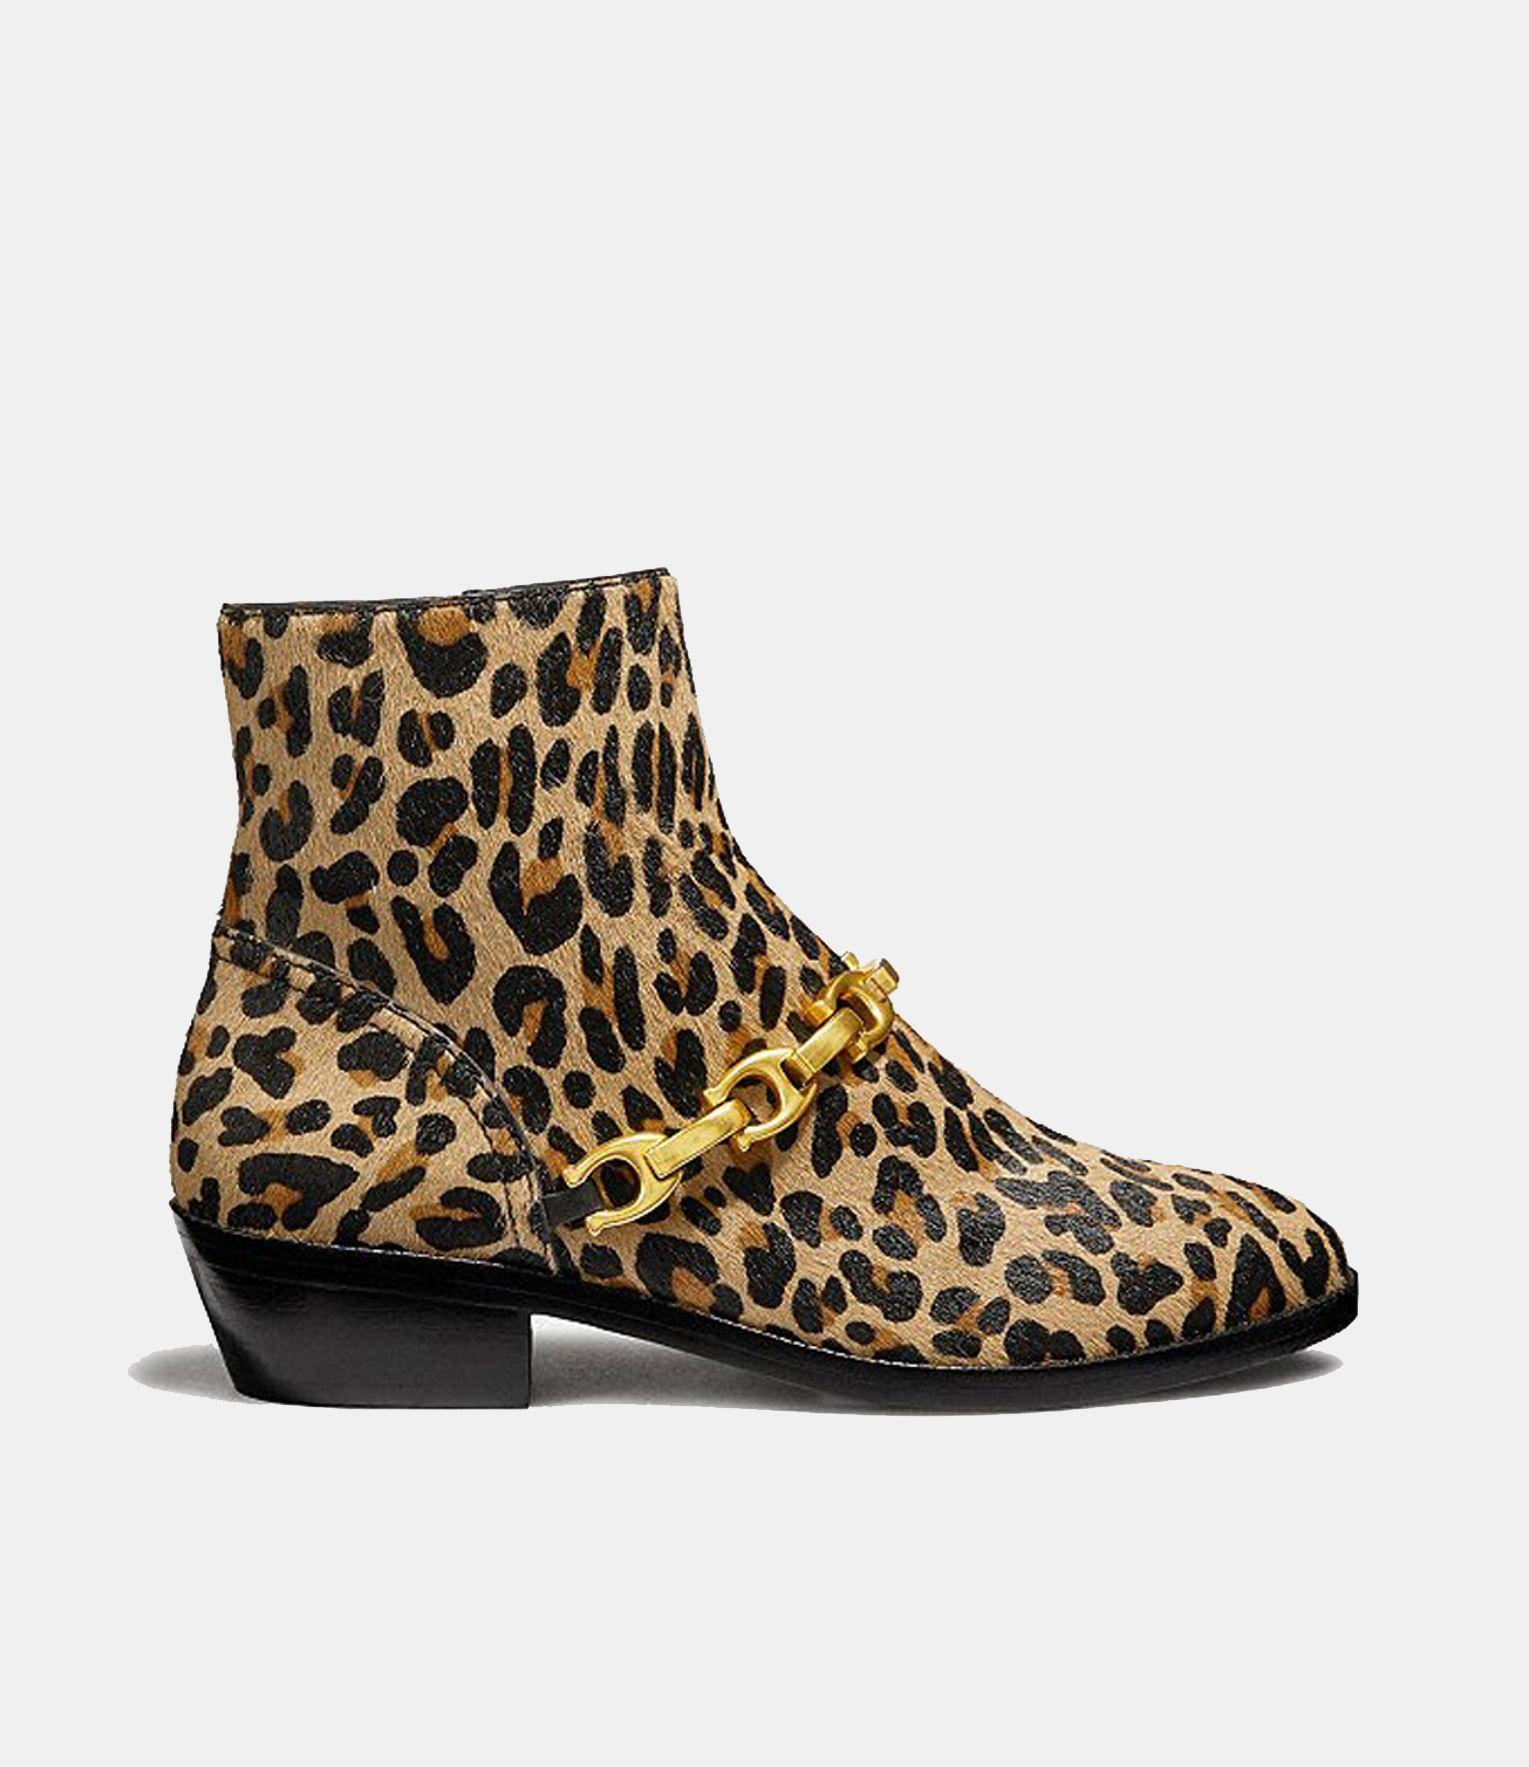 Maja Leopard Print Haircalf Suede Ankle Boots | Shoes | L